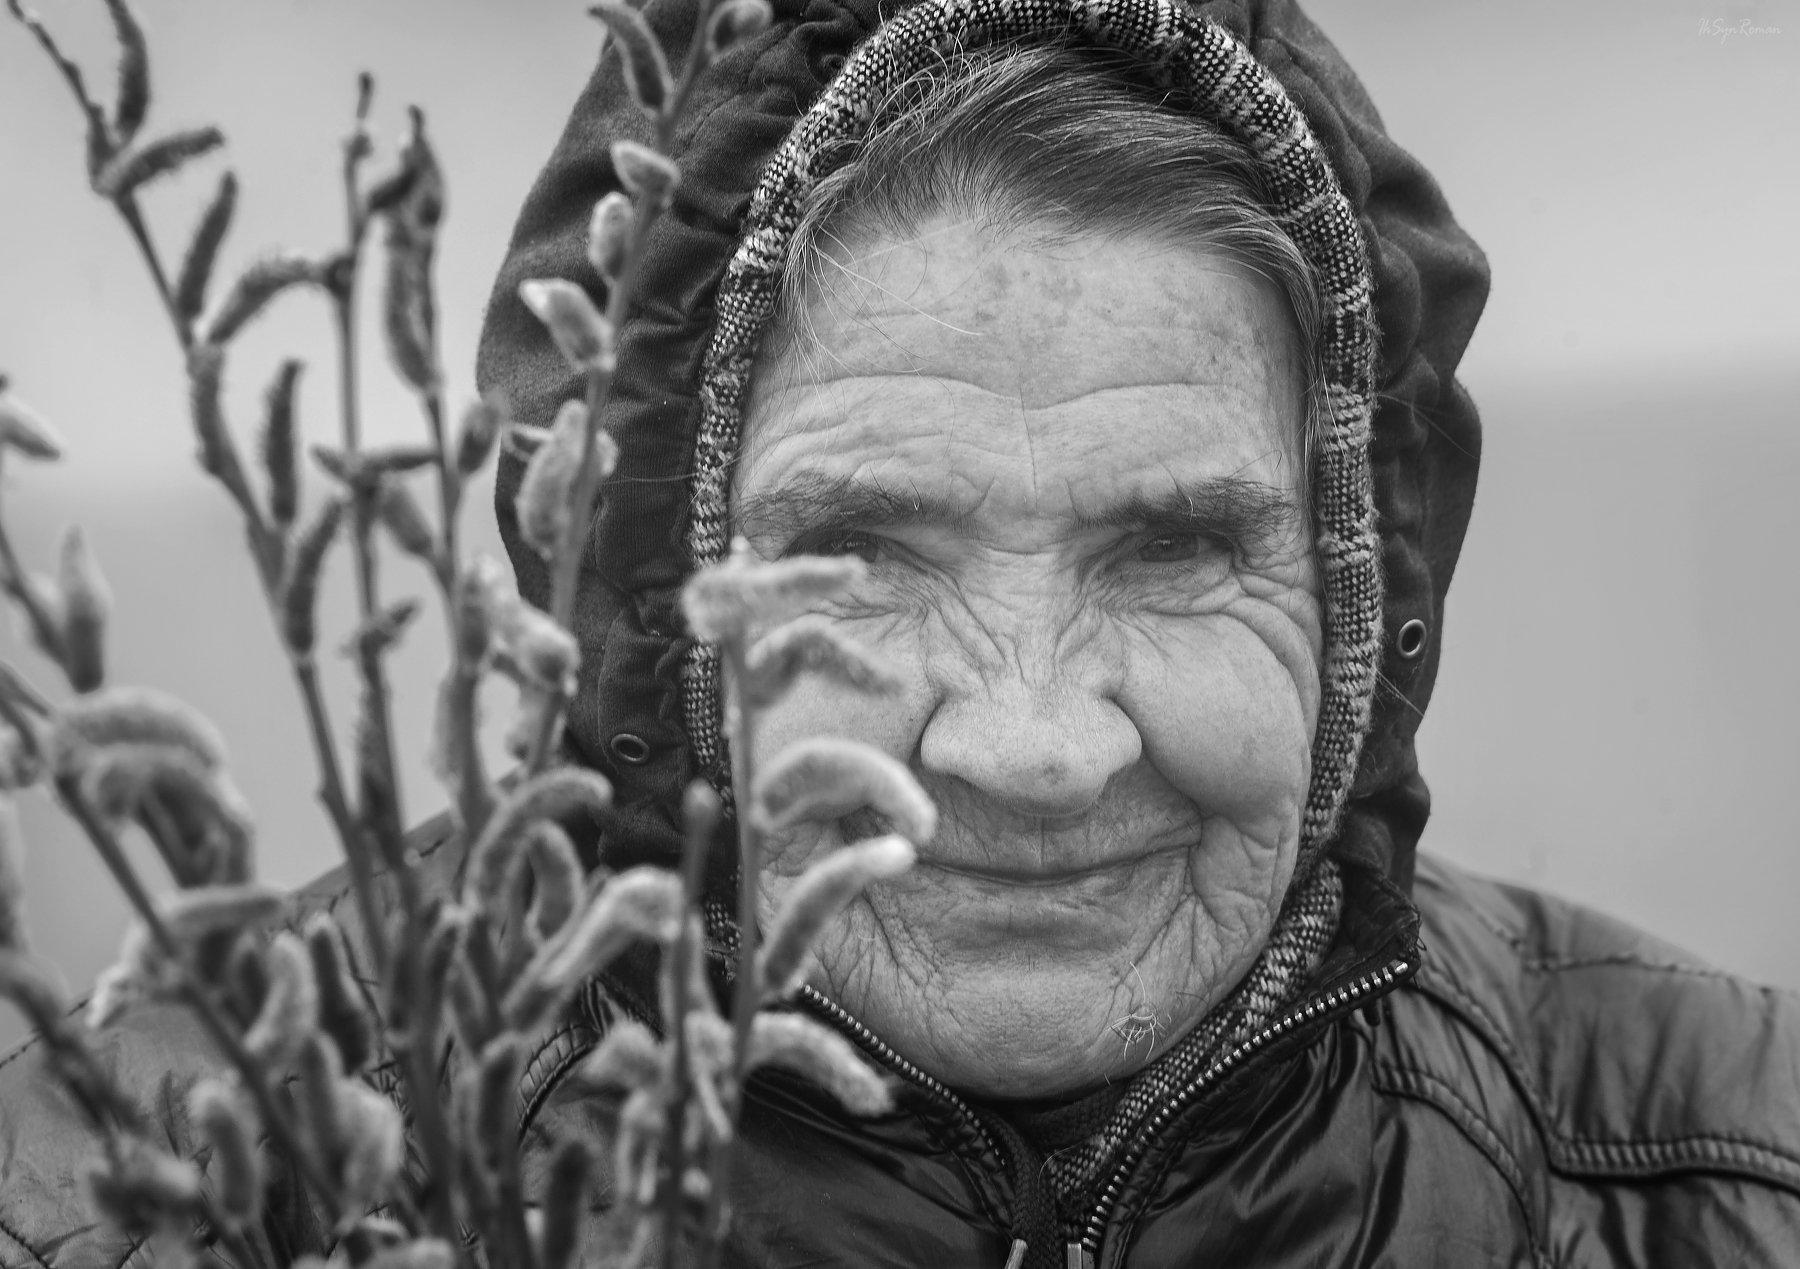 женщина,верба,жанр,улица,портрет, Roma  Chitinskiy